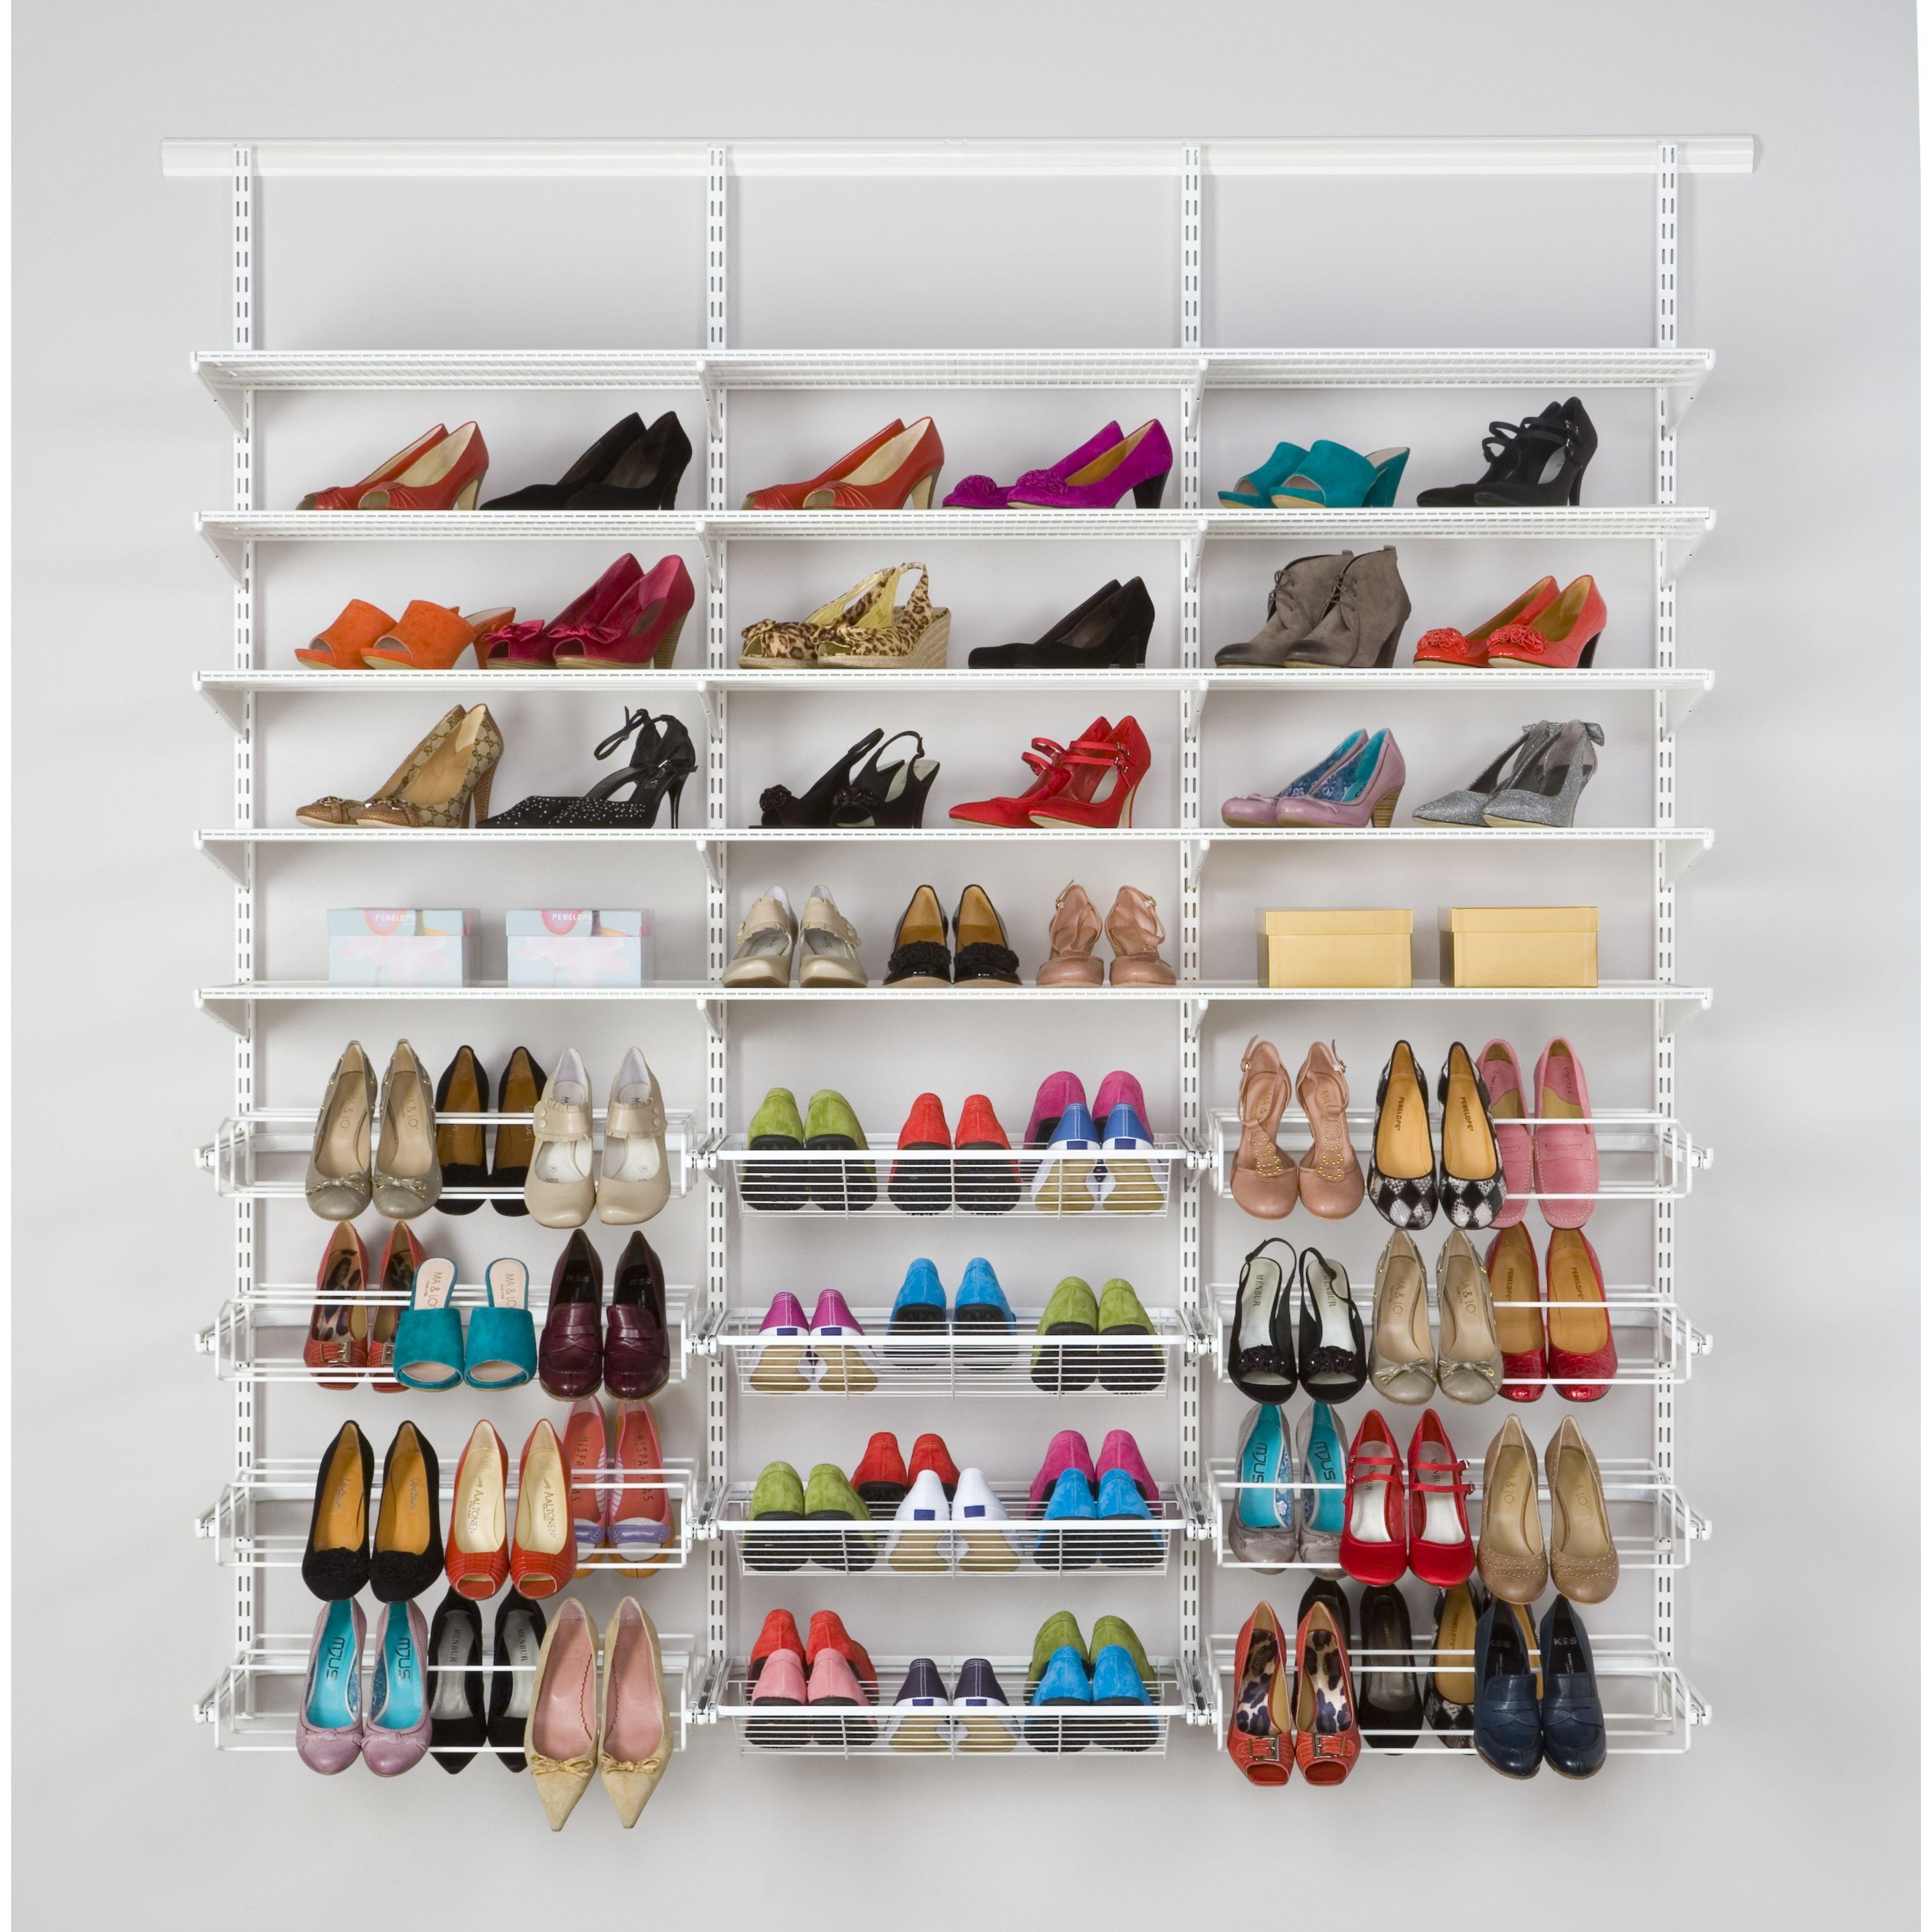 Rangement suspendu pour chaussures Elfa